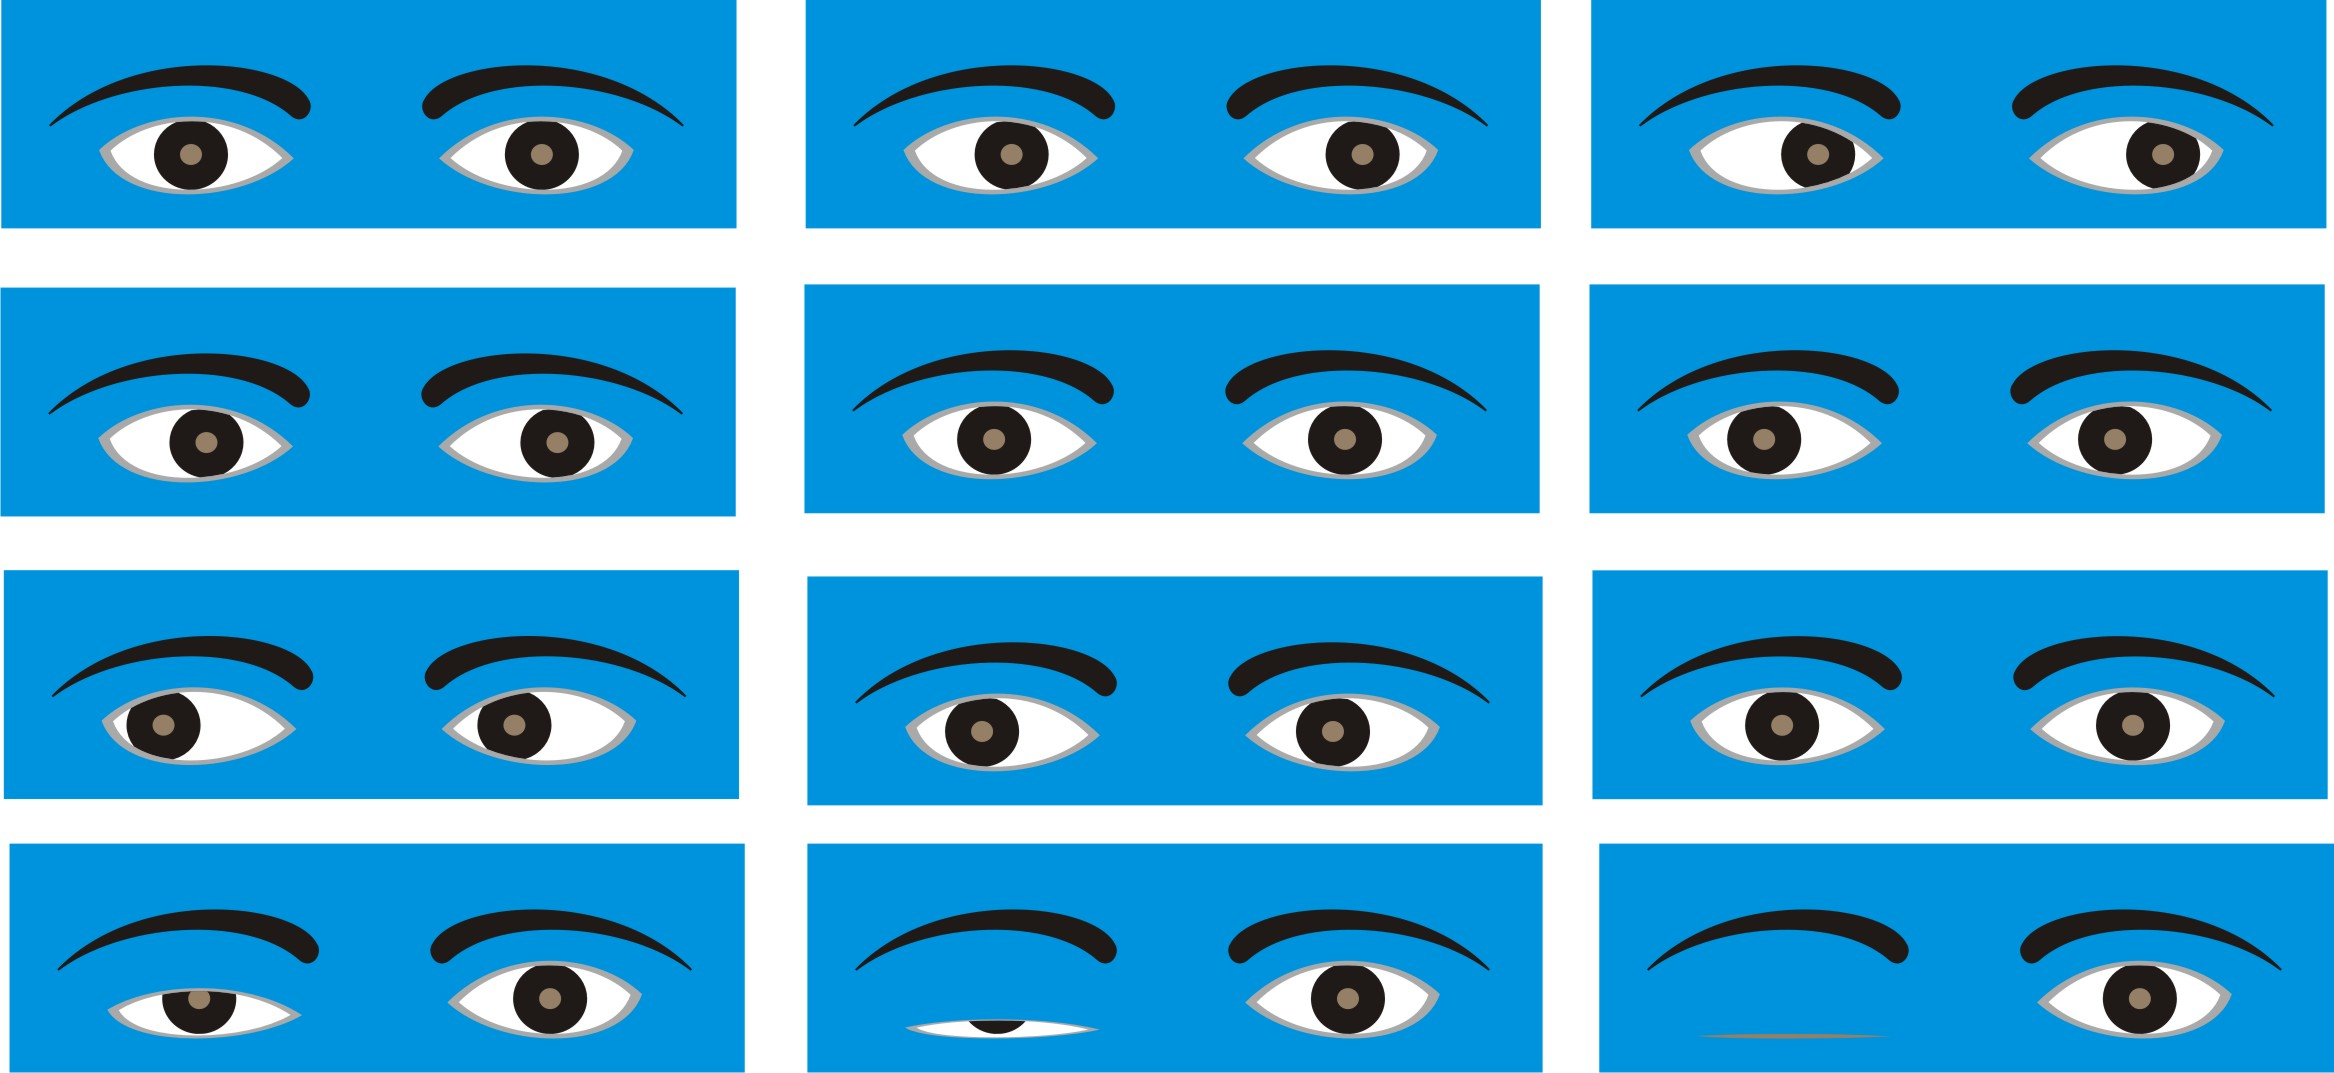 Latihan Corel Eyes Indahnya Design